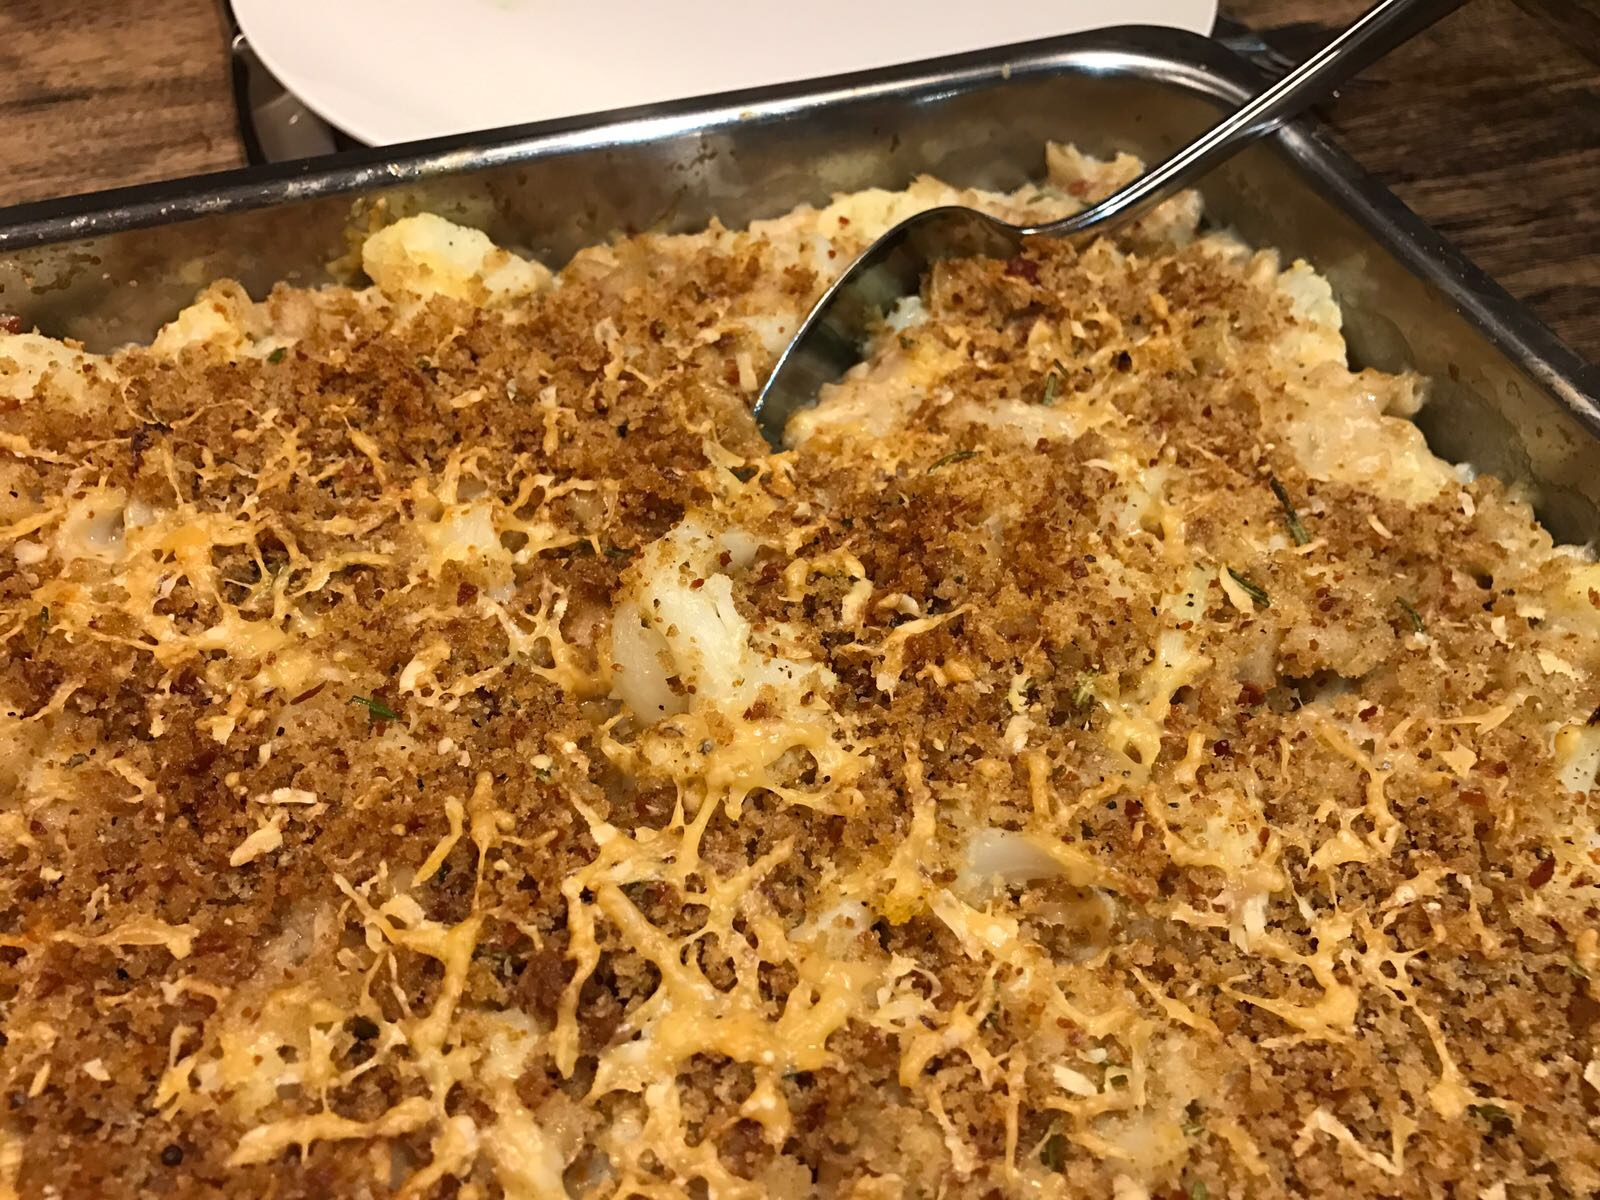 Ovenschotel met bloemkool en macaroni, pancetta en kaas